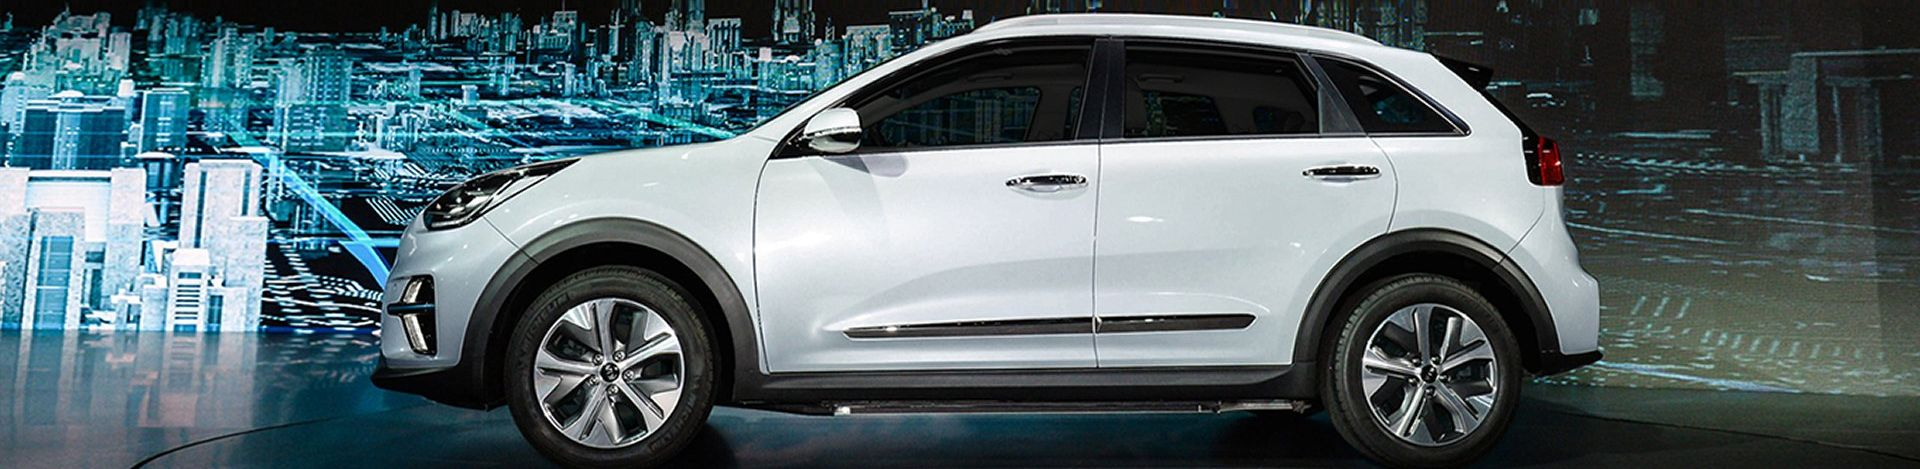 2019 Kia Niro EV Coming Soon near North County, CA